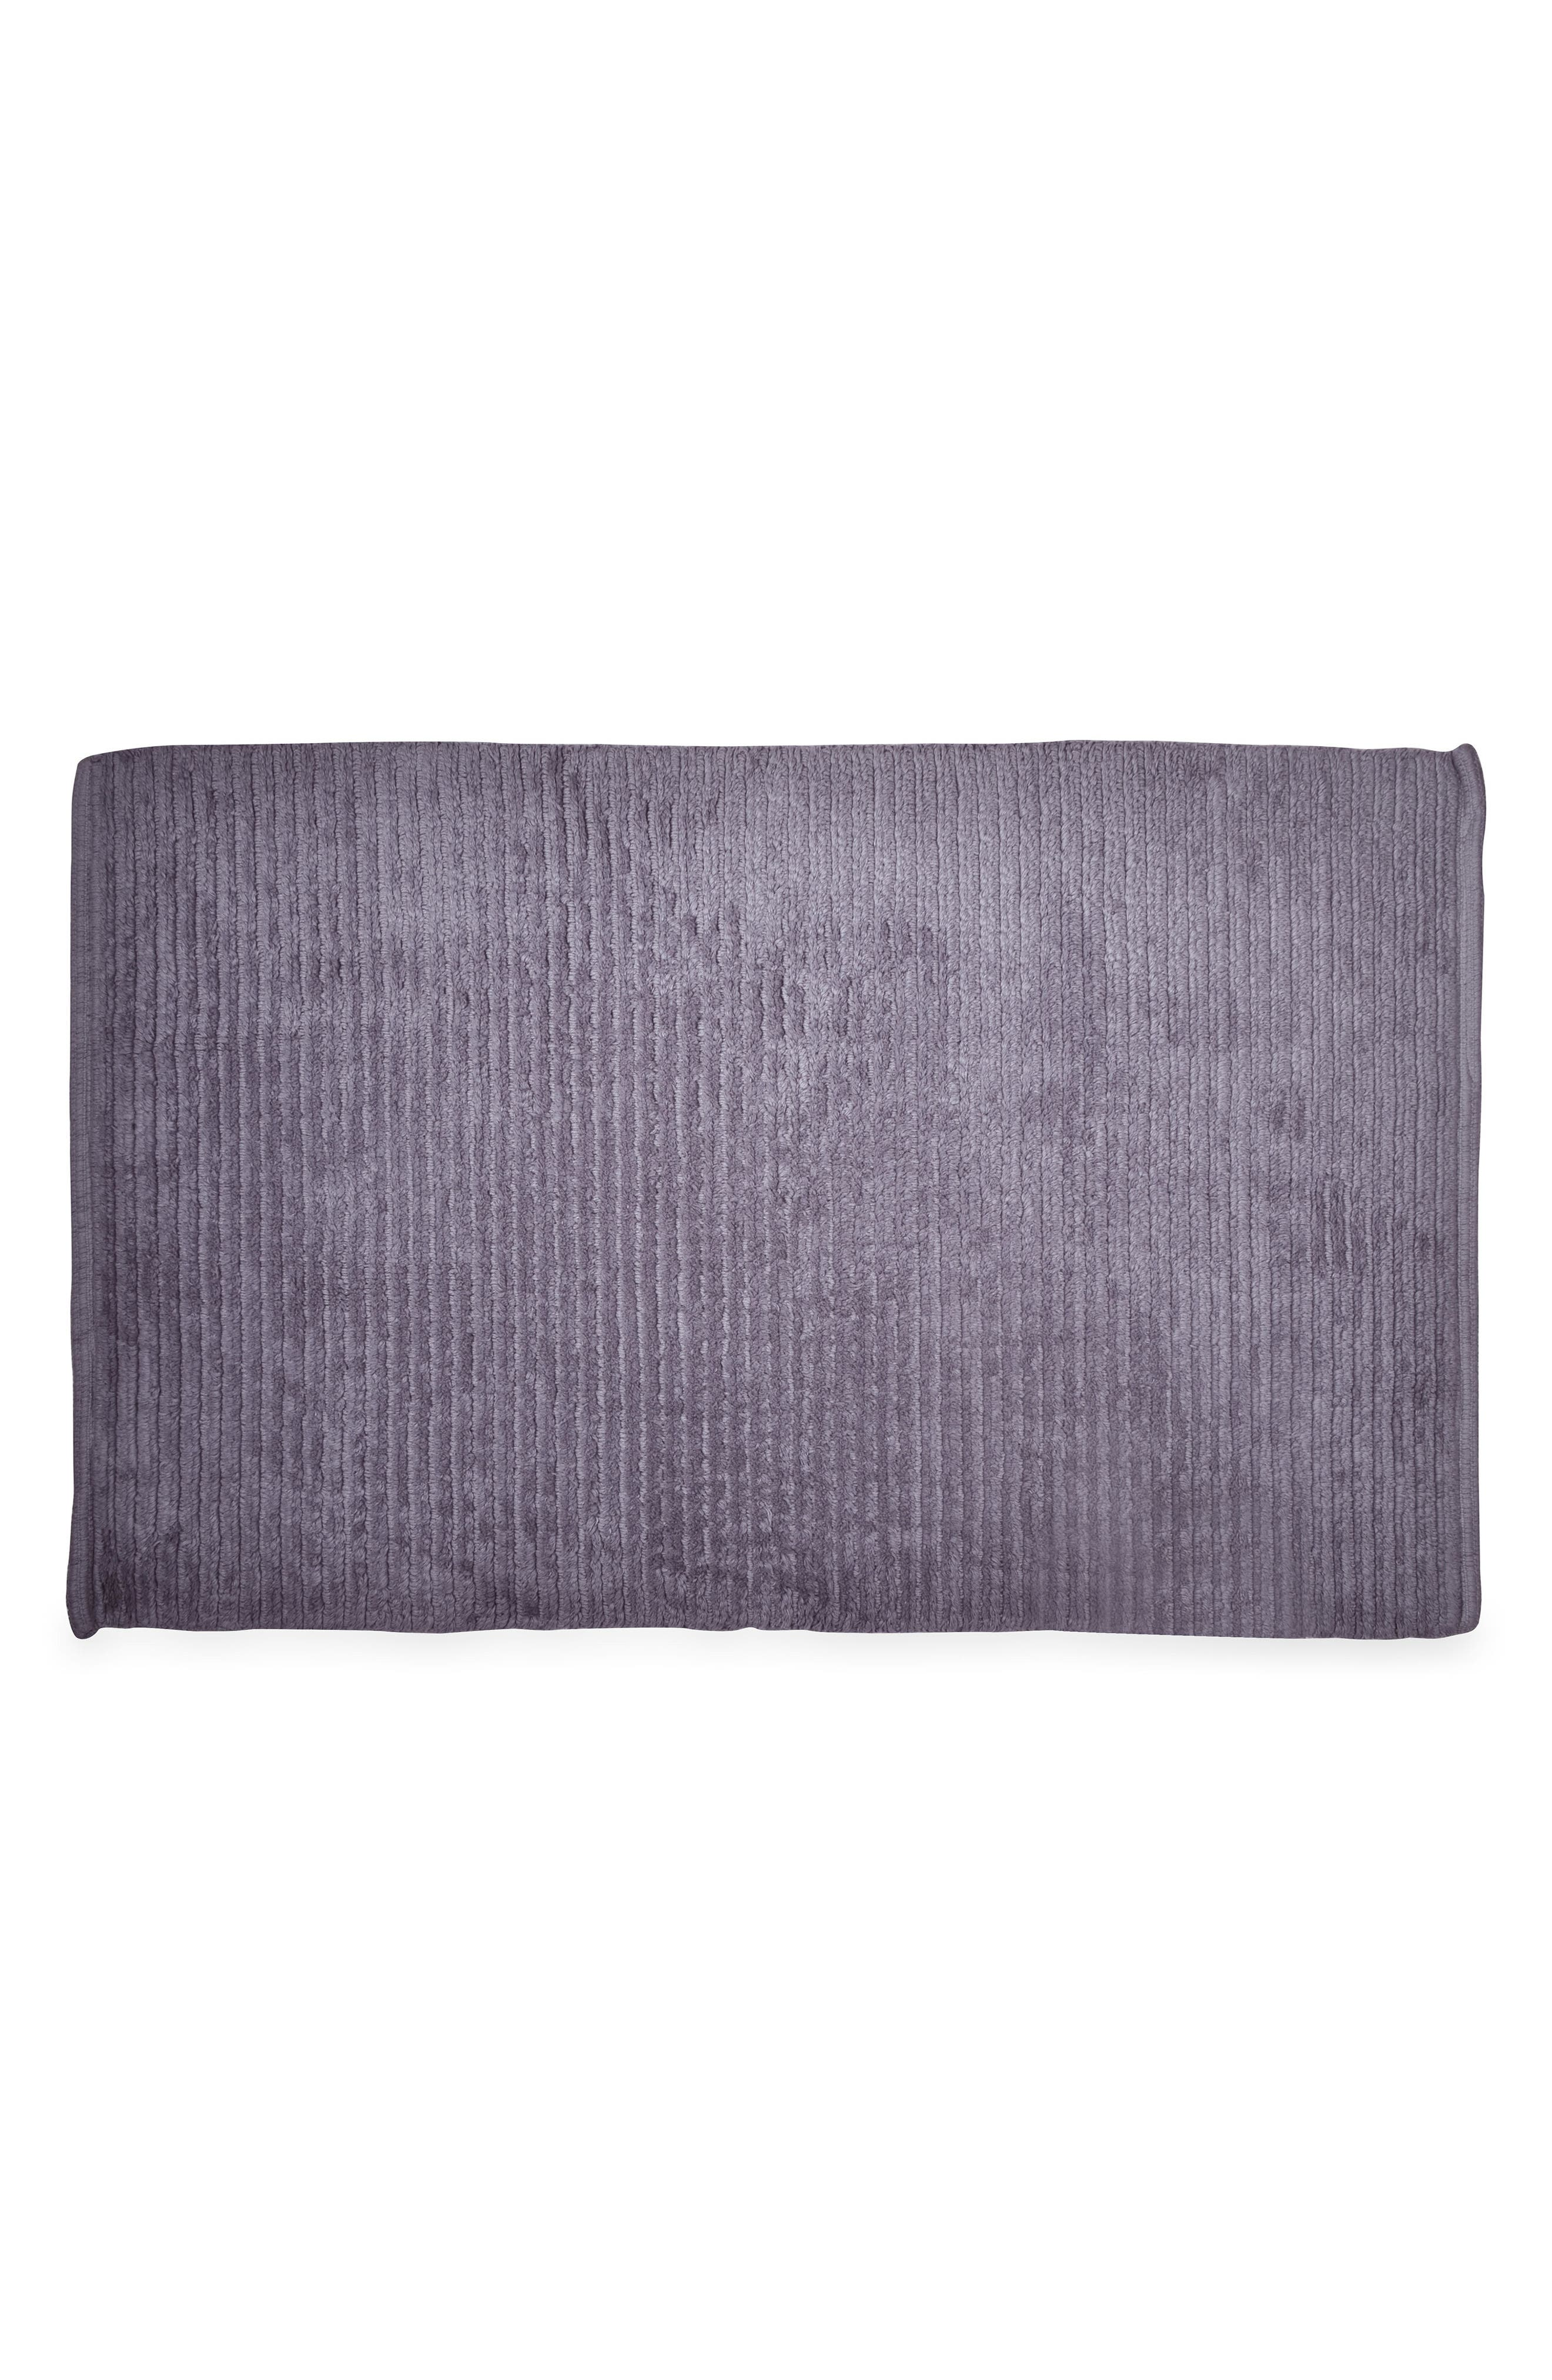 Mercer Bath Rug,                         Main,                         color, Dusty Lavender